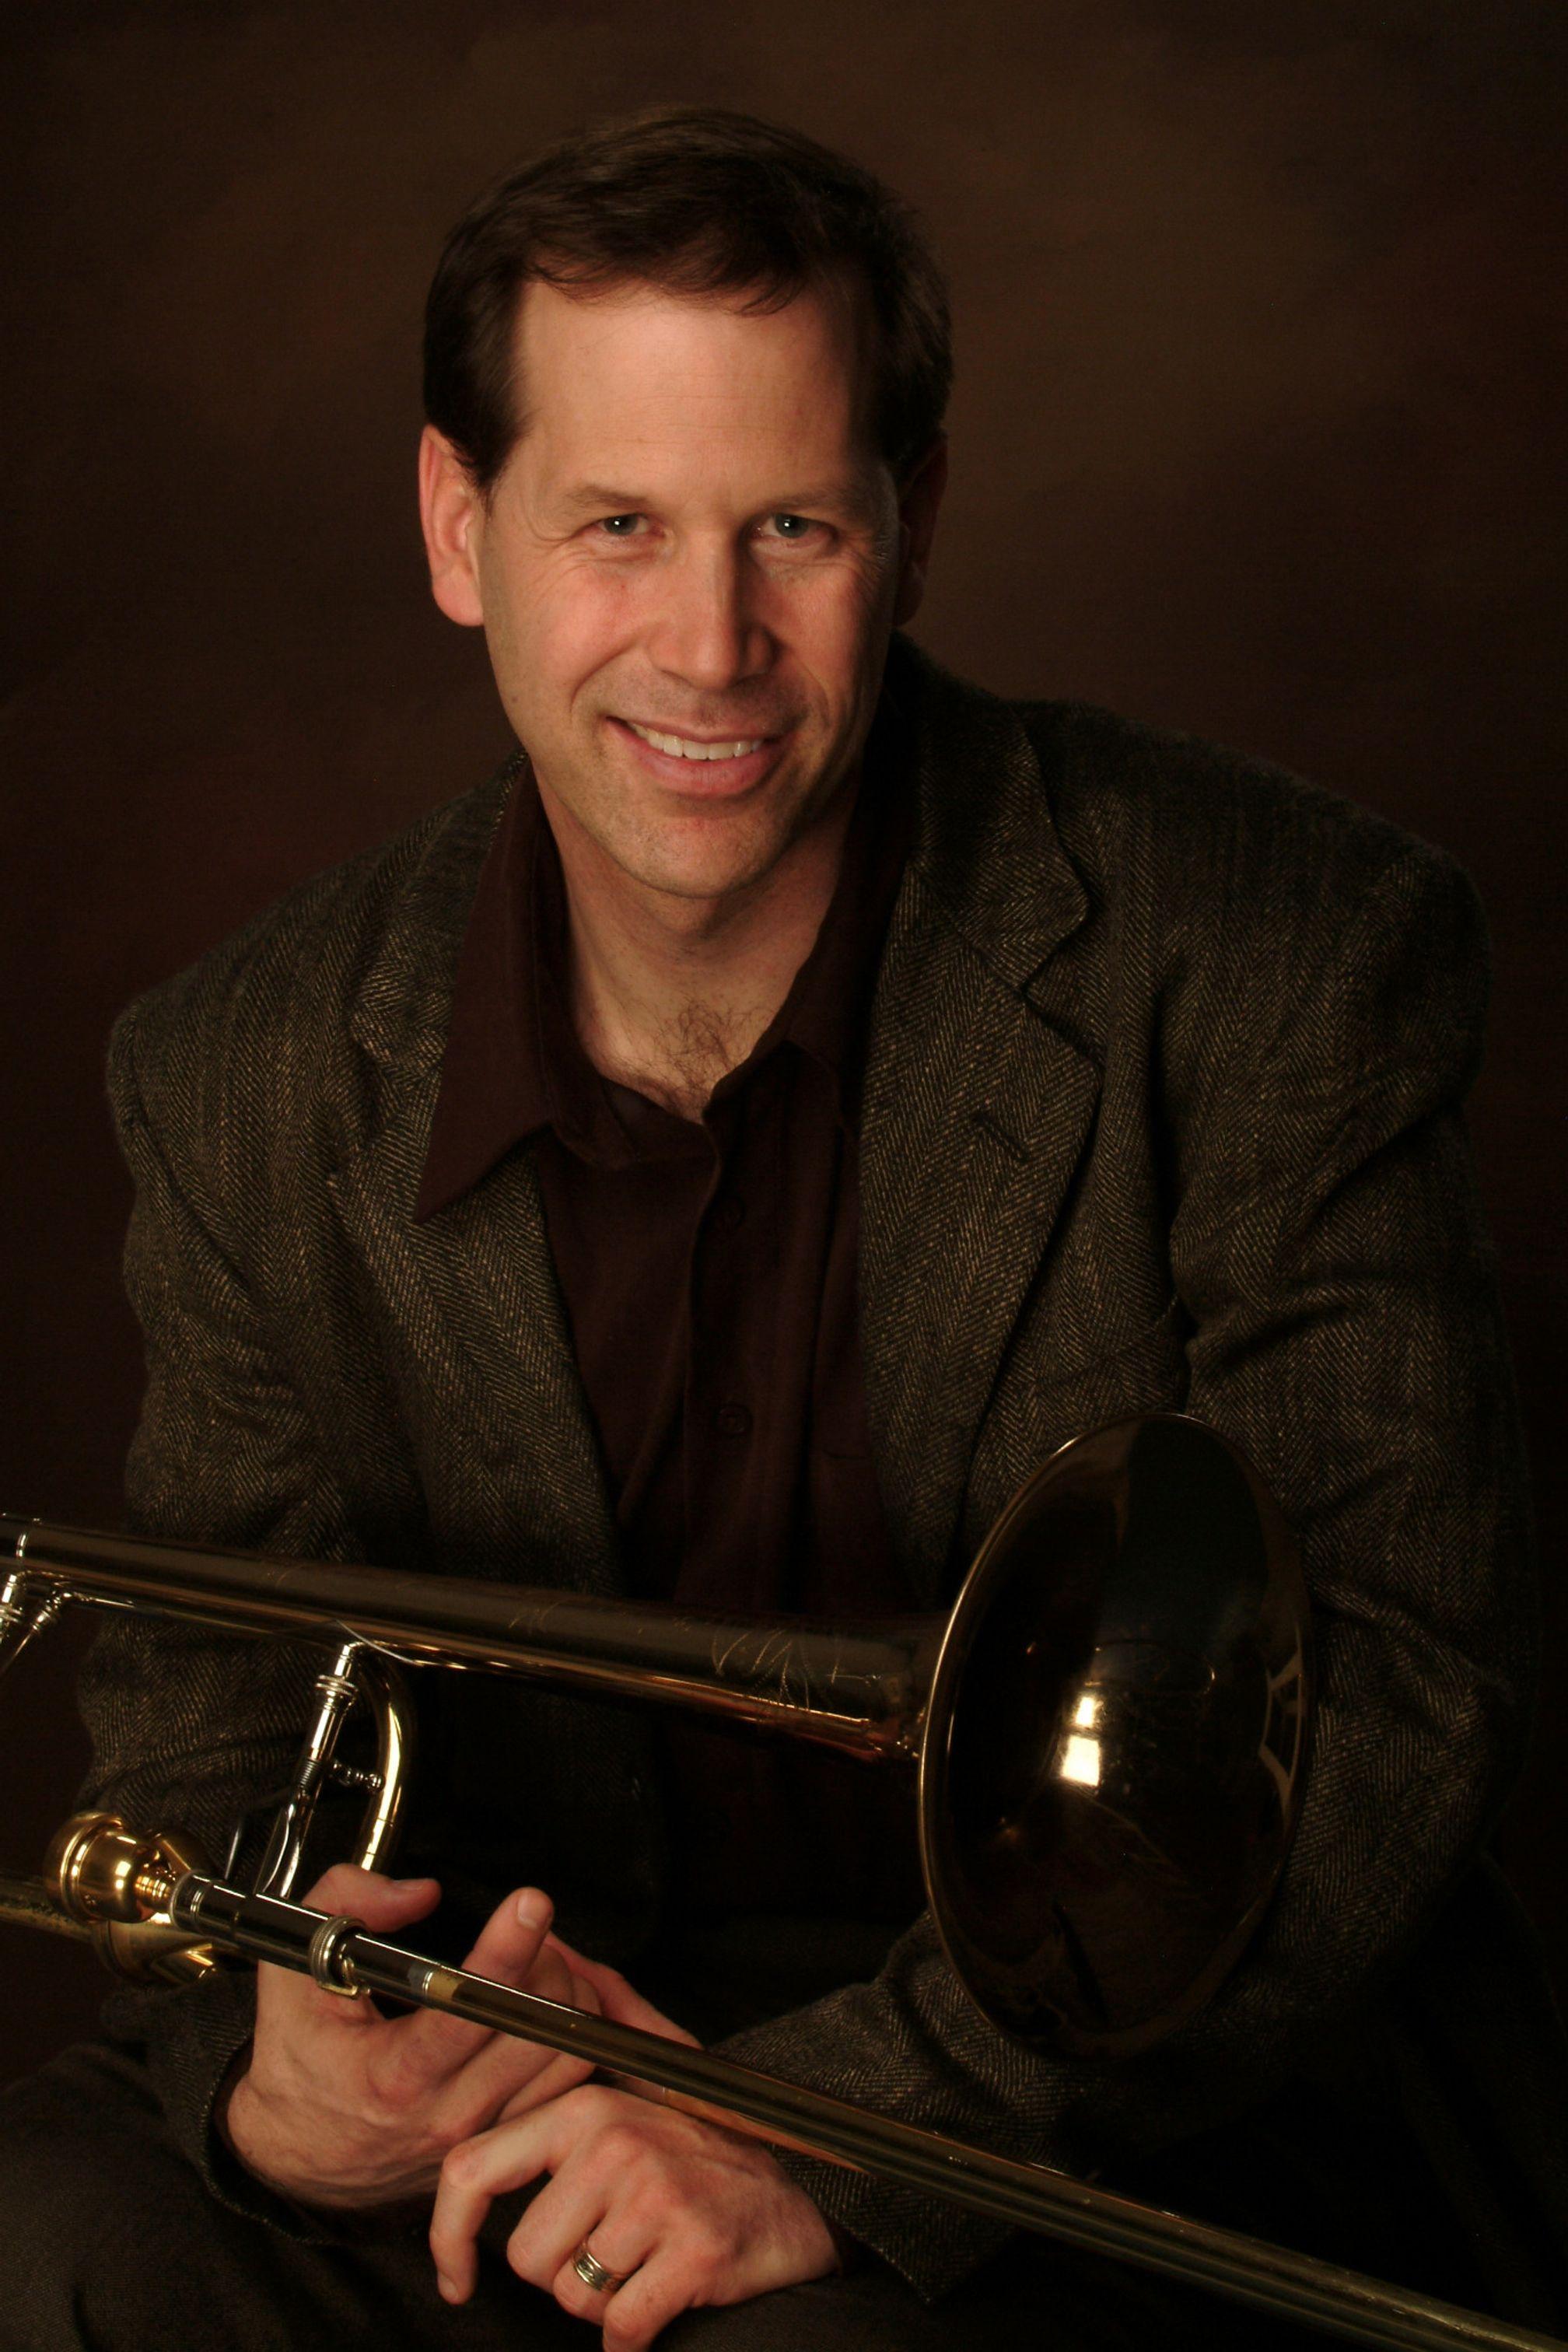 Joseph Martin holding a trombone